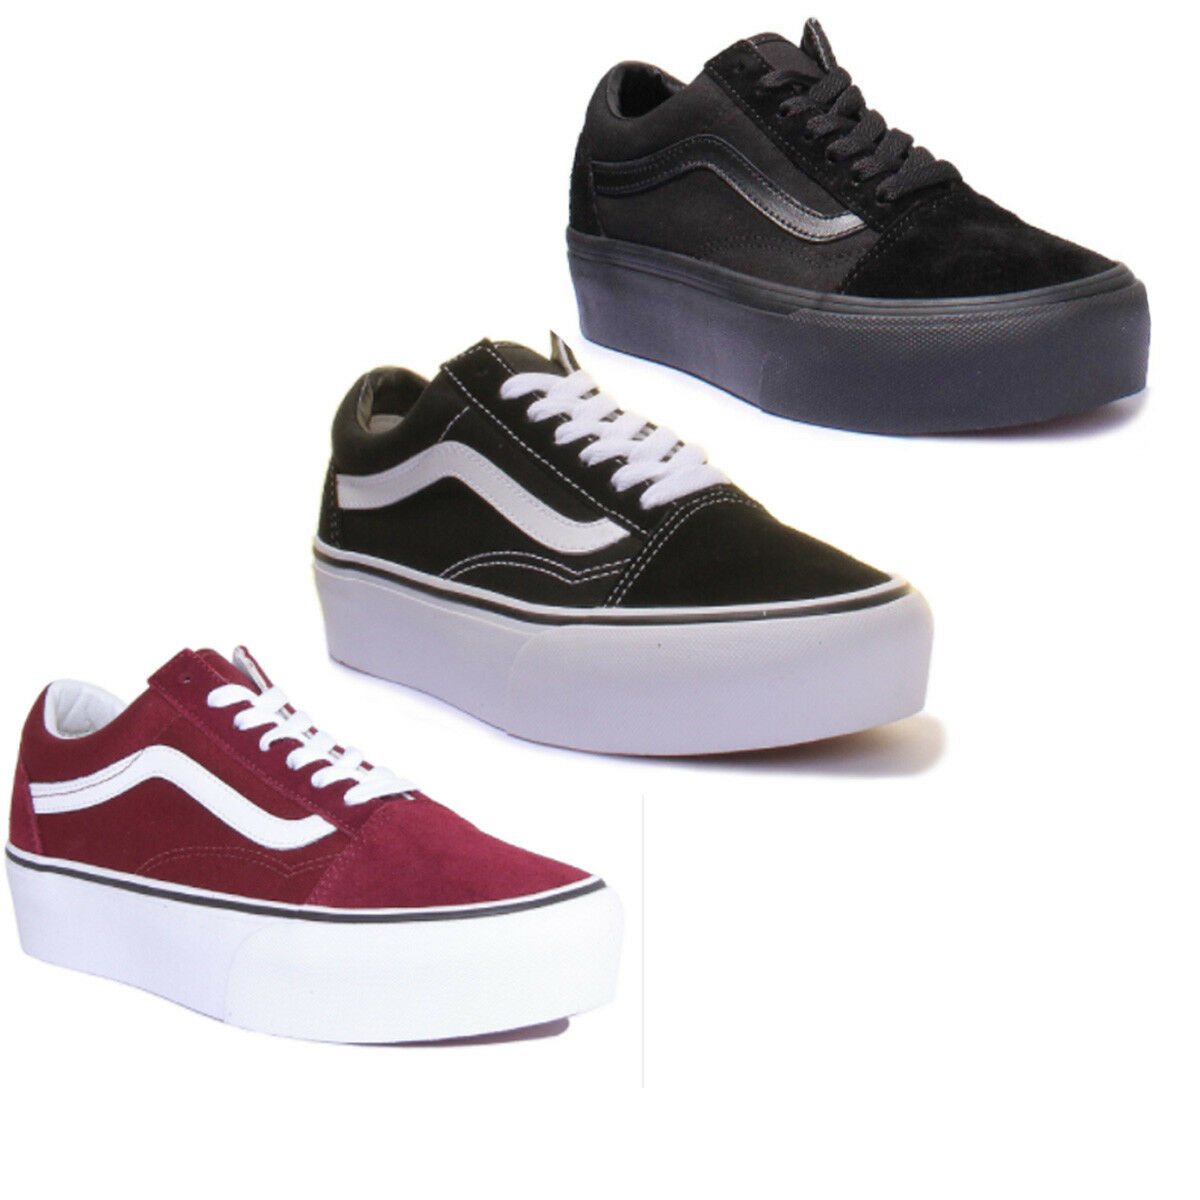 Vans Old Skool Sneaker Platform Donna in Pelle Scamosciata Tela Scarpe Da Ginnastica Bianco Nero Taglia